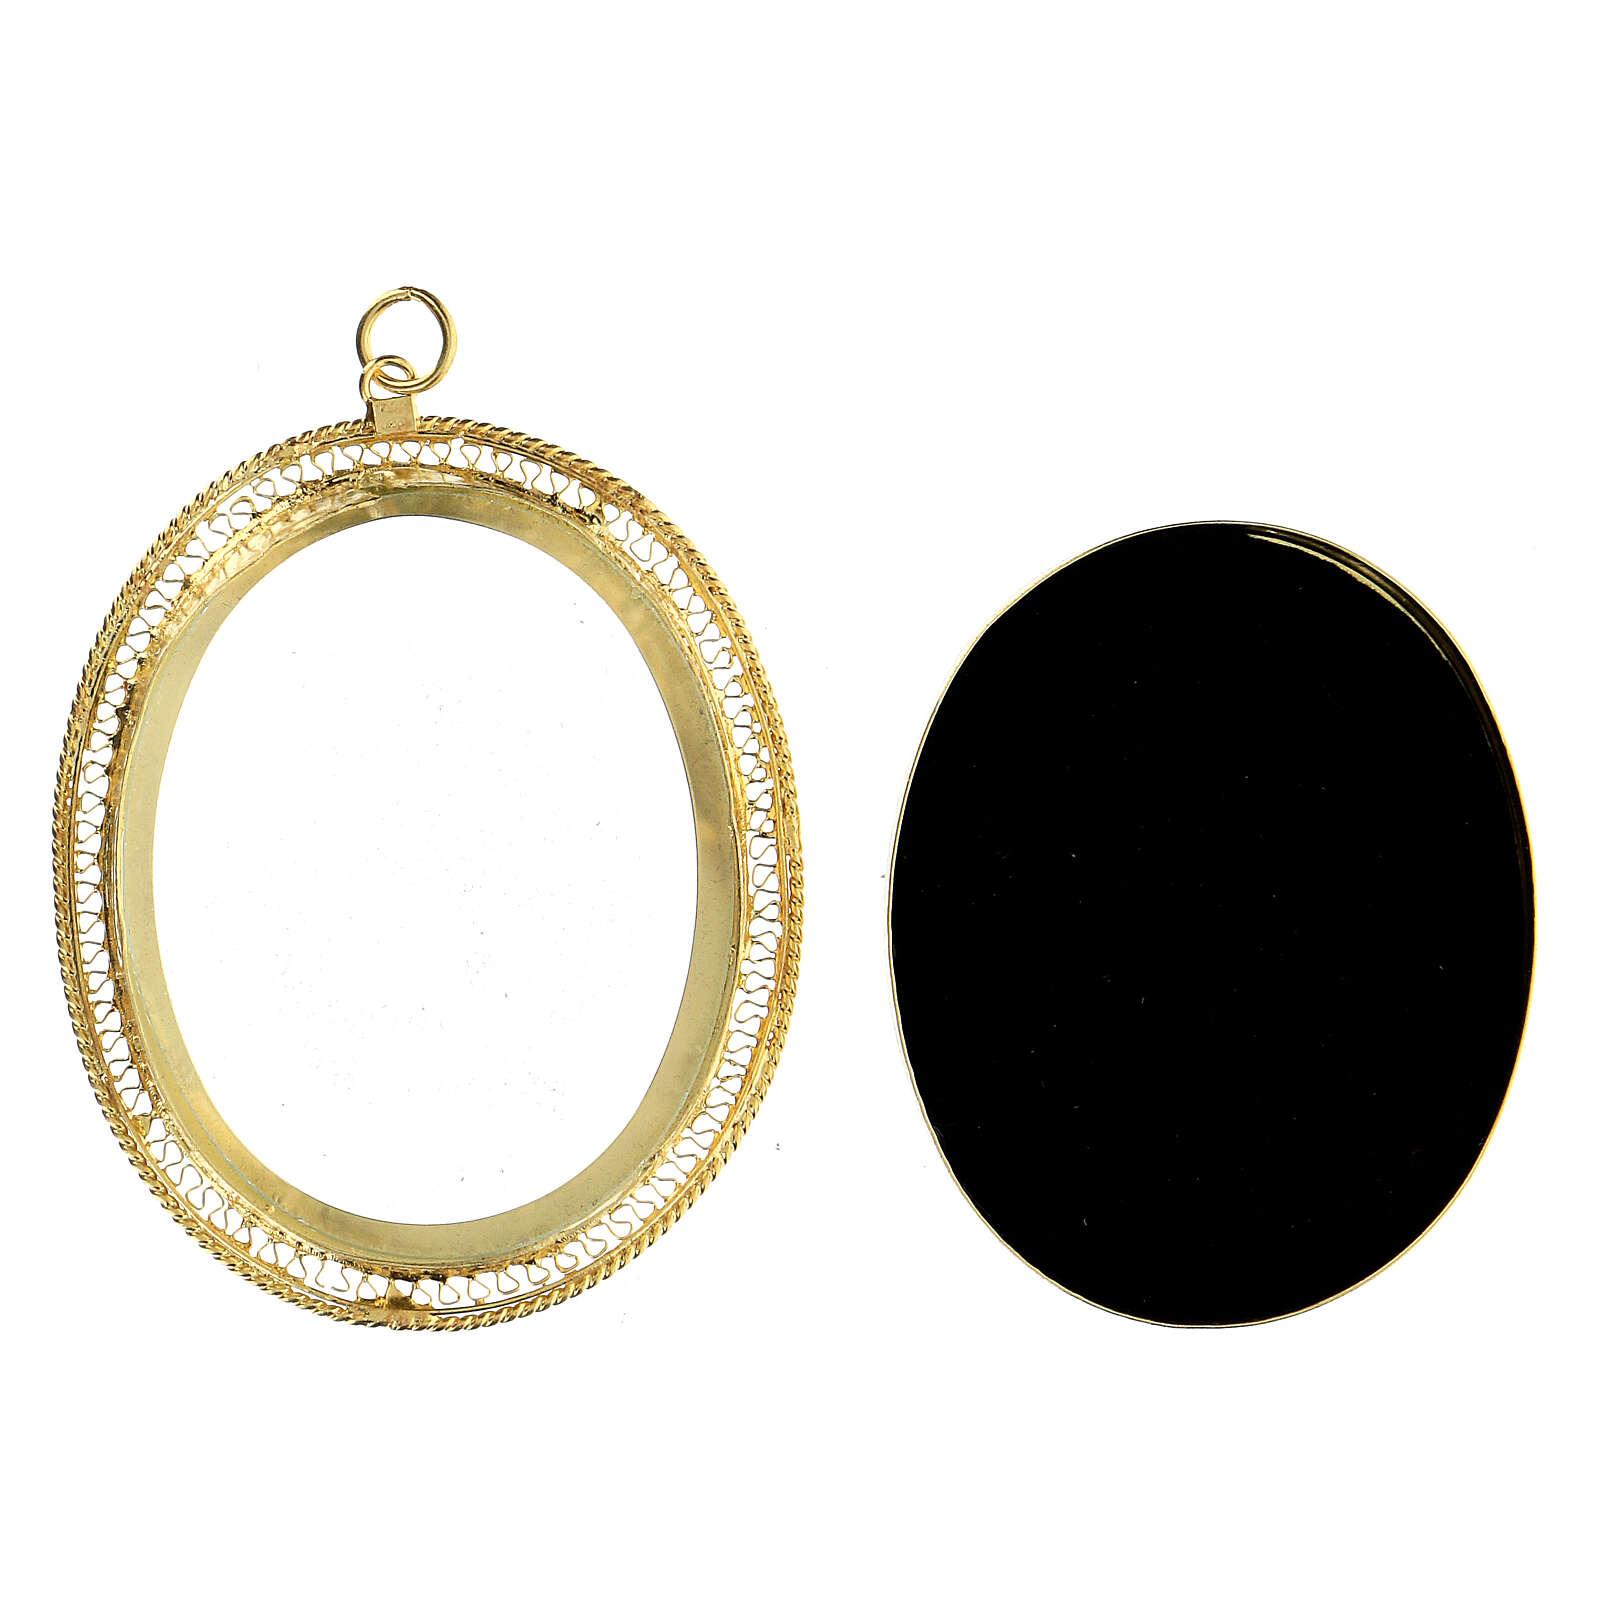 Teca porta reliquie ovale filigrana argento 800 dorata 6x5 cm 4